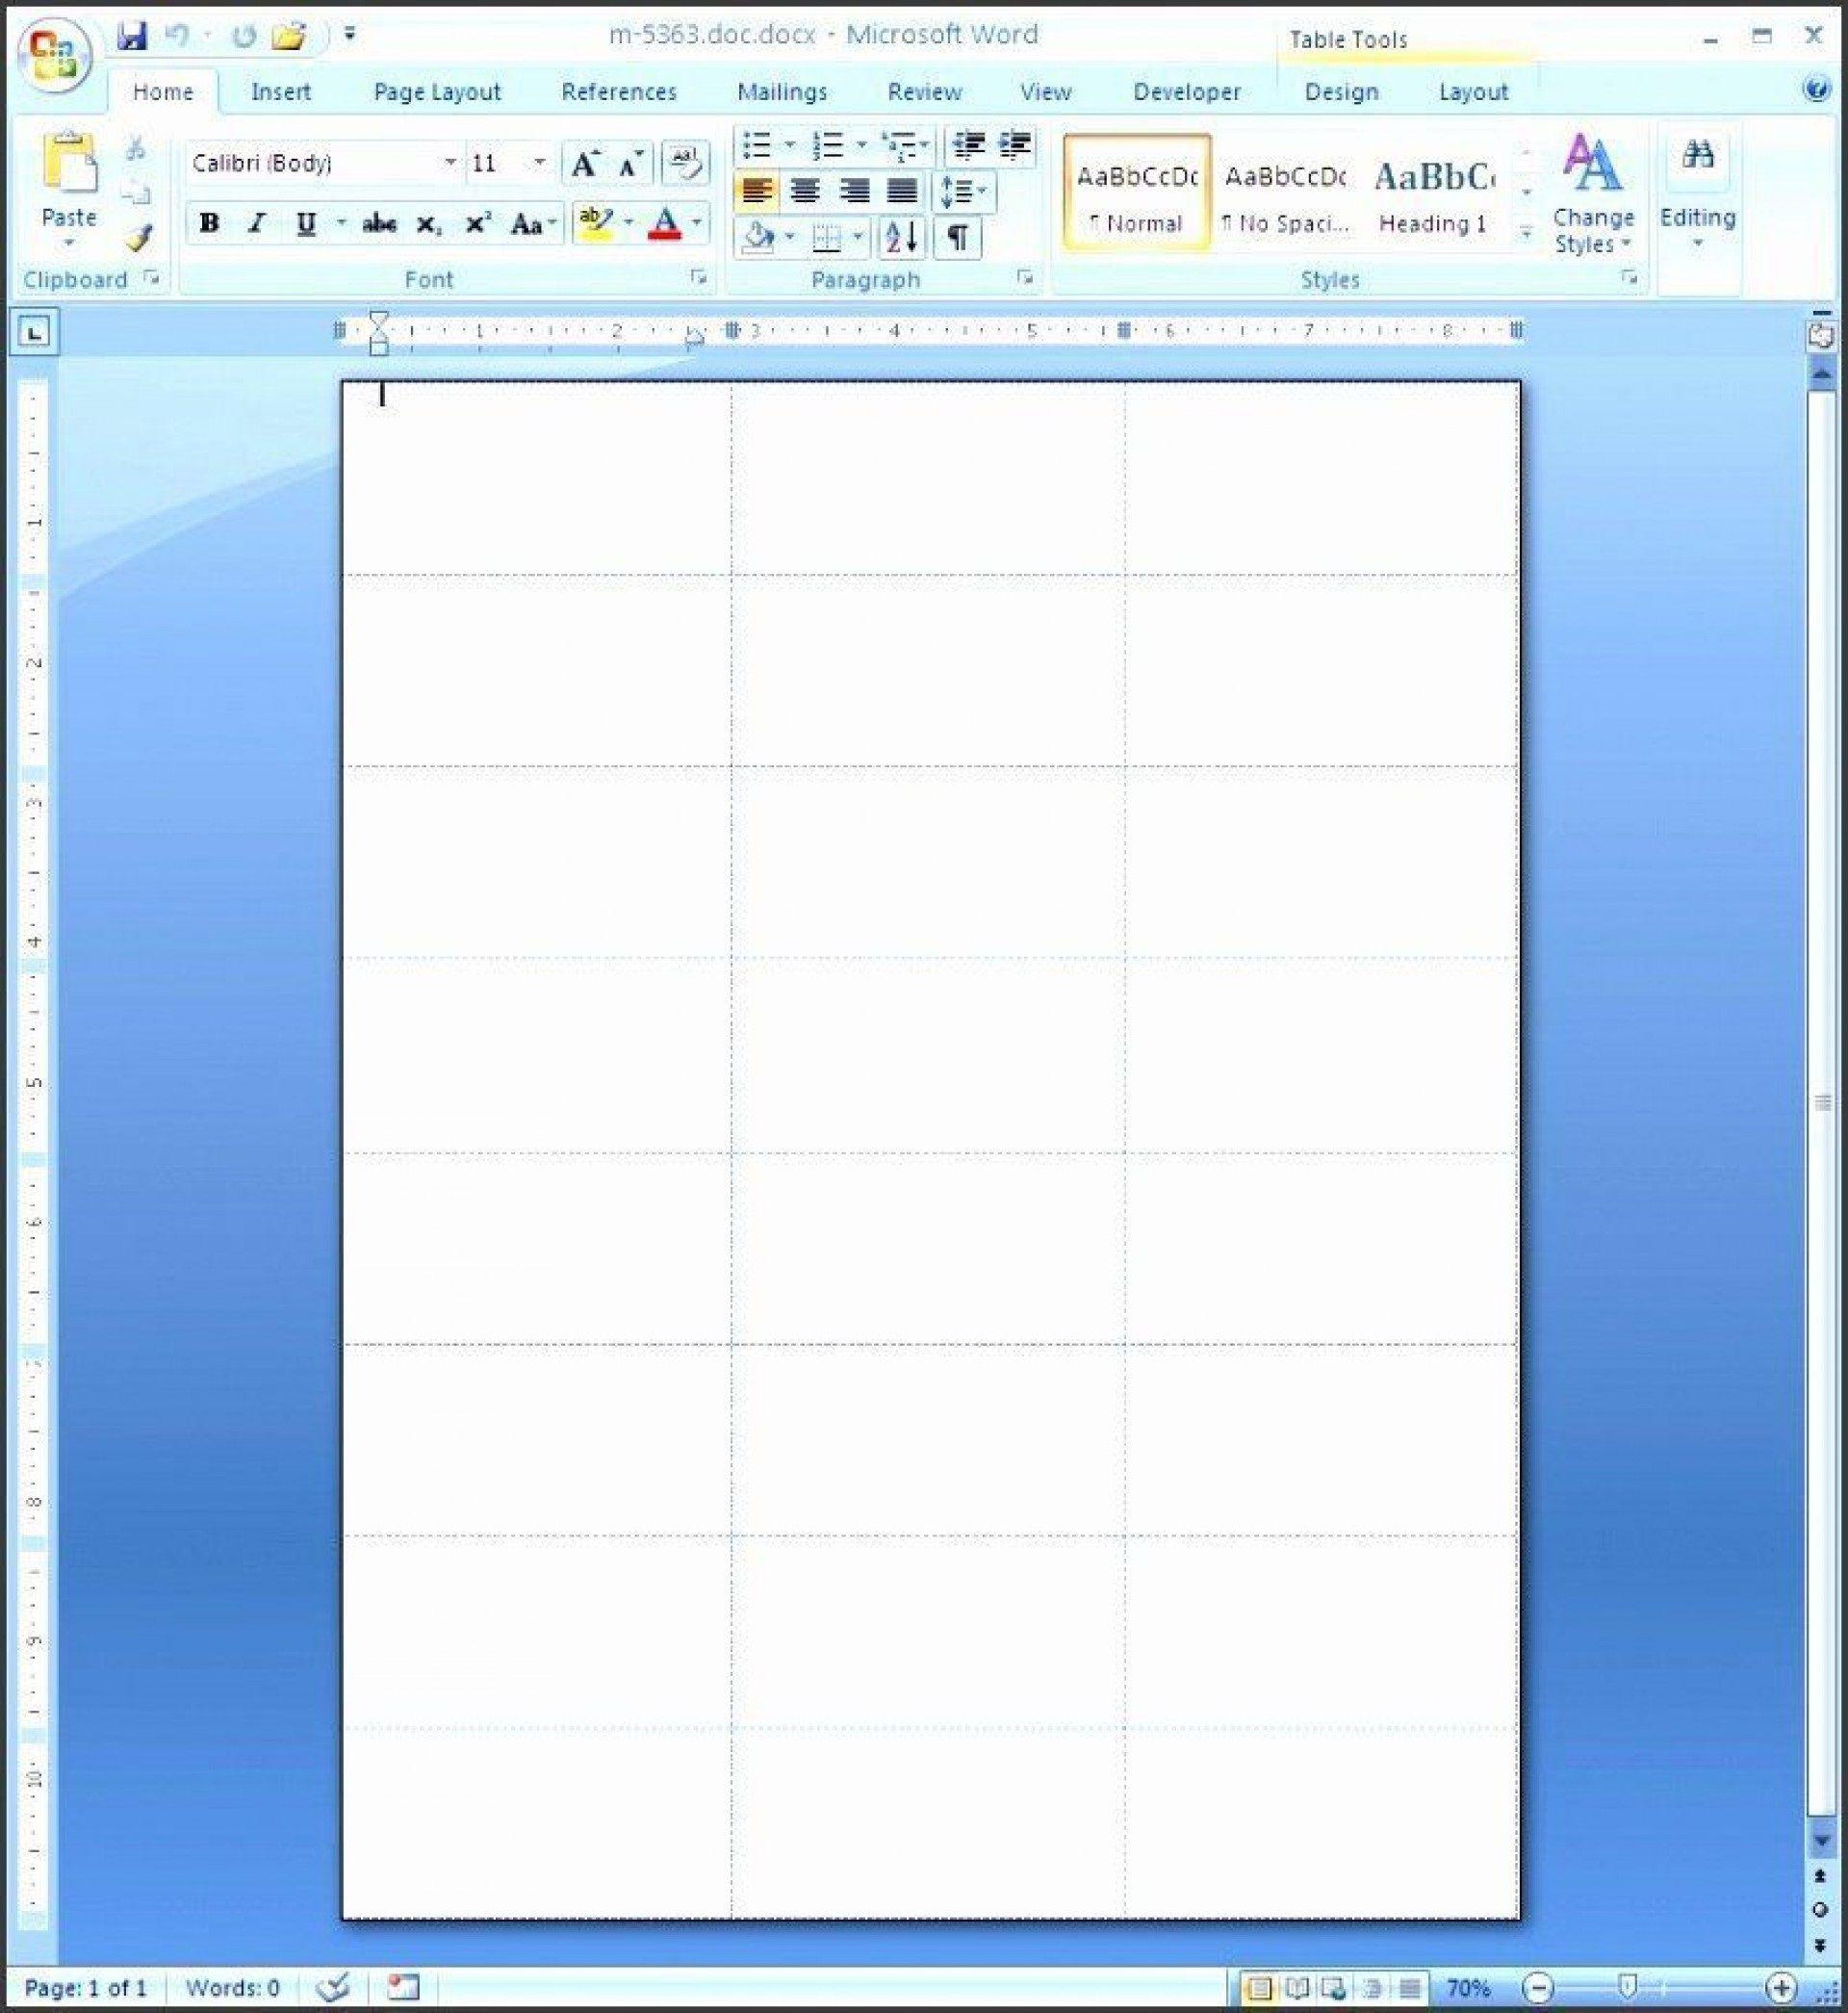 009 Stupendou Microsoft Word Addres Label Template 30 Per Sheet Photo Full